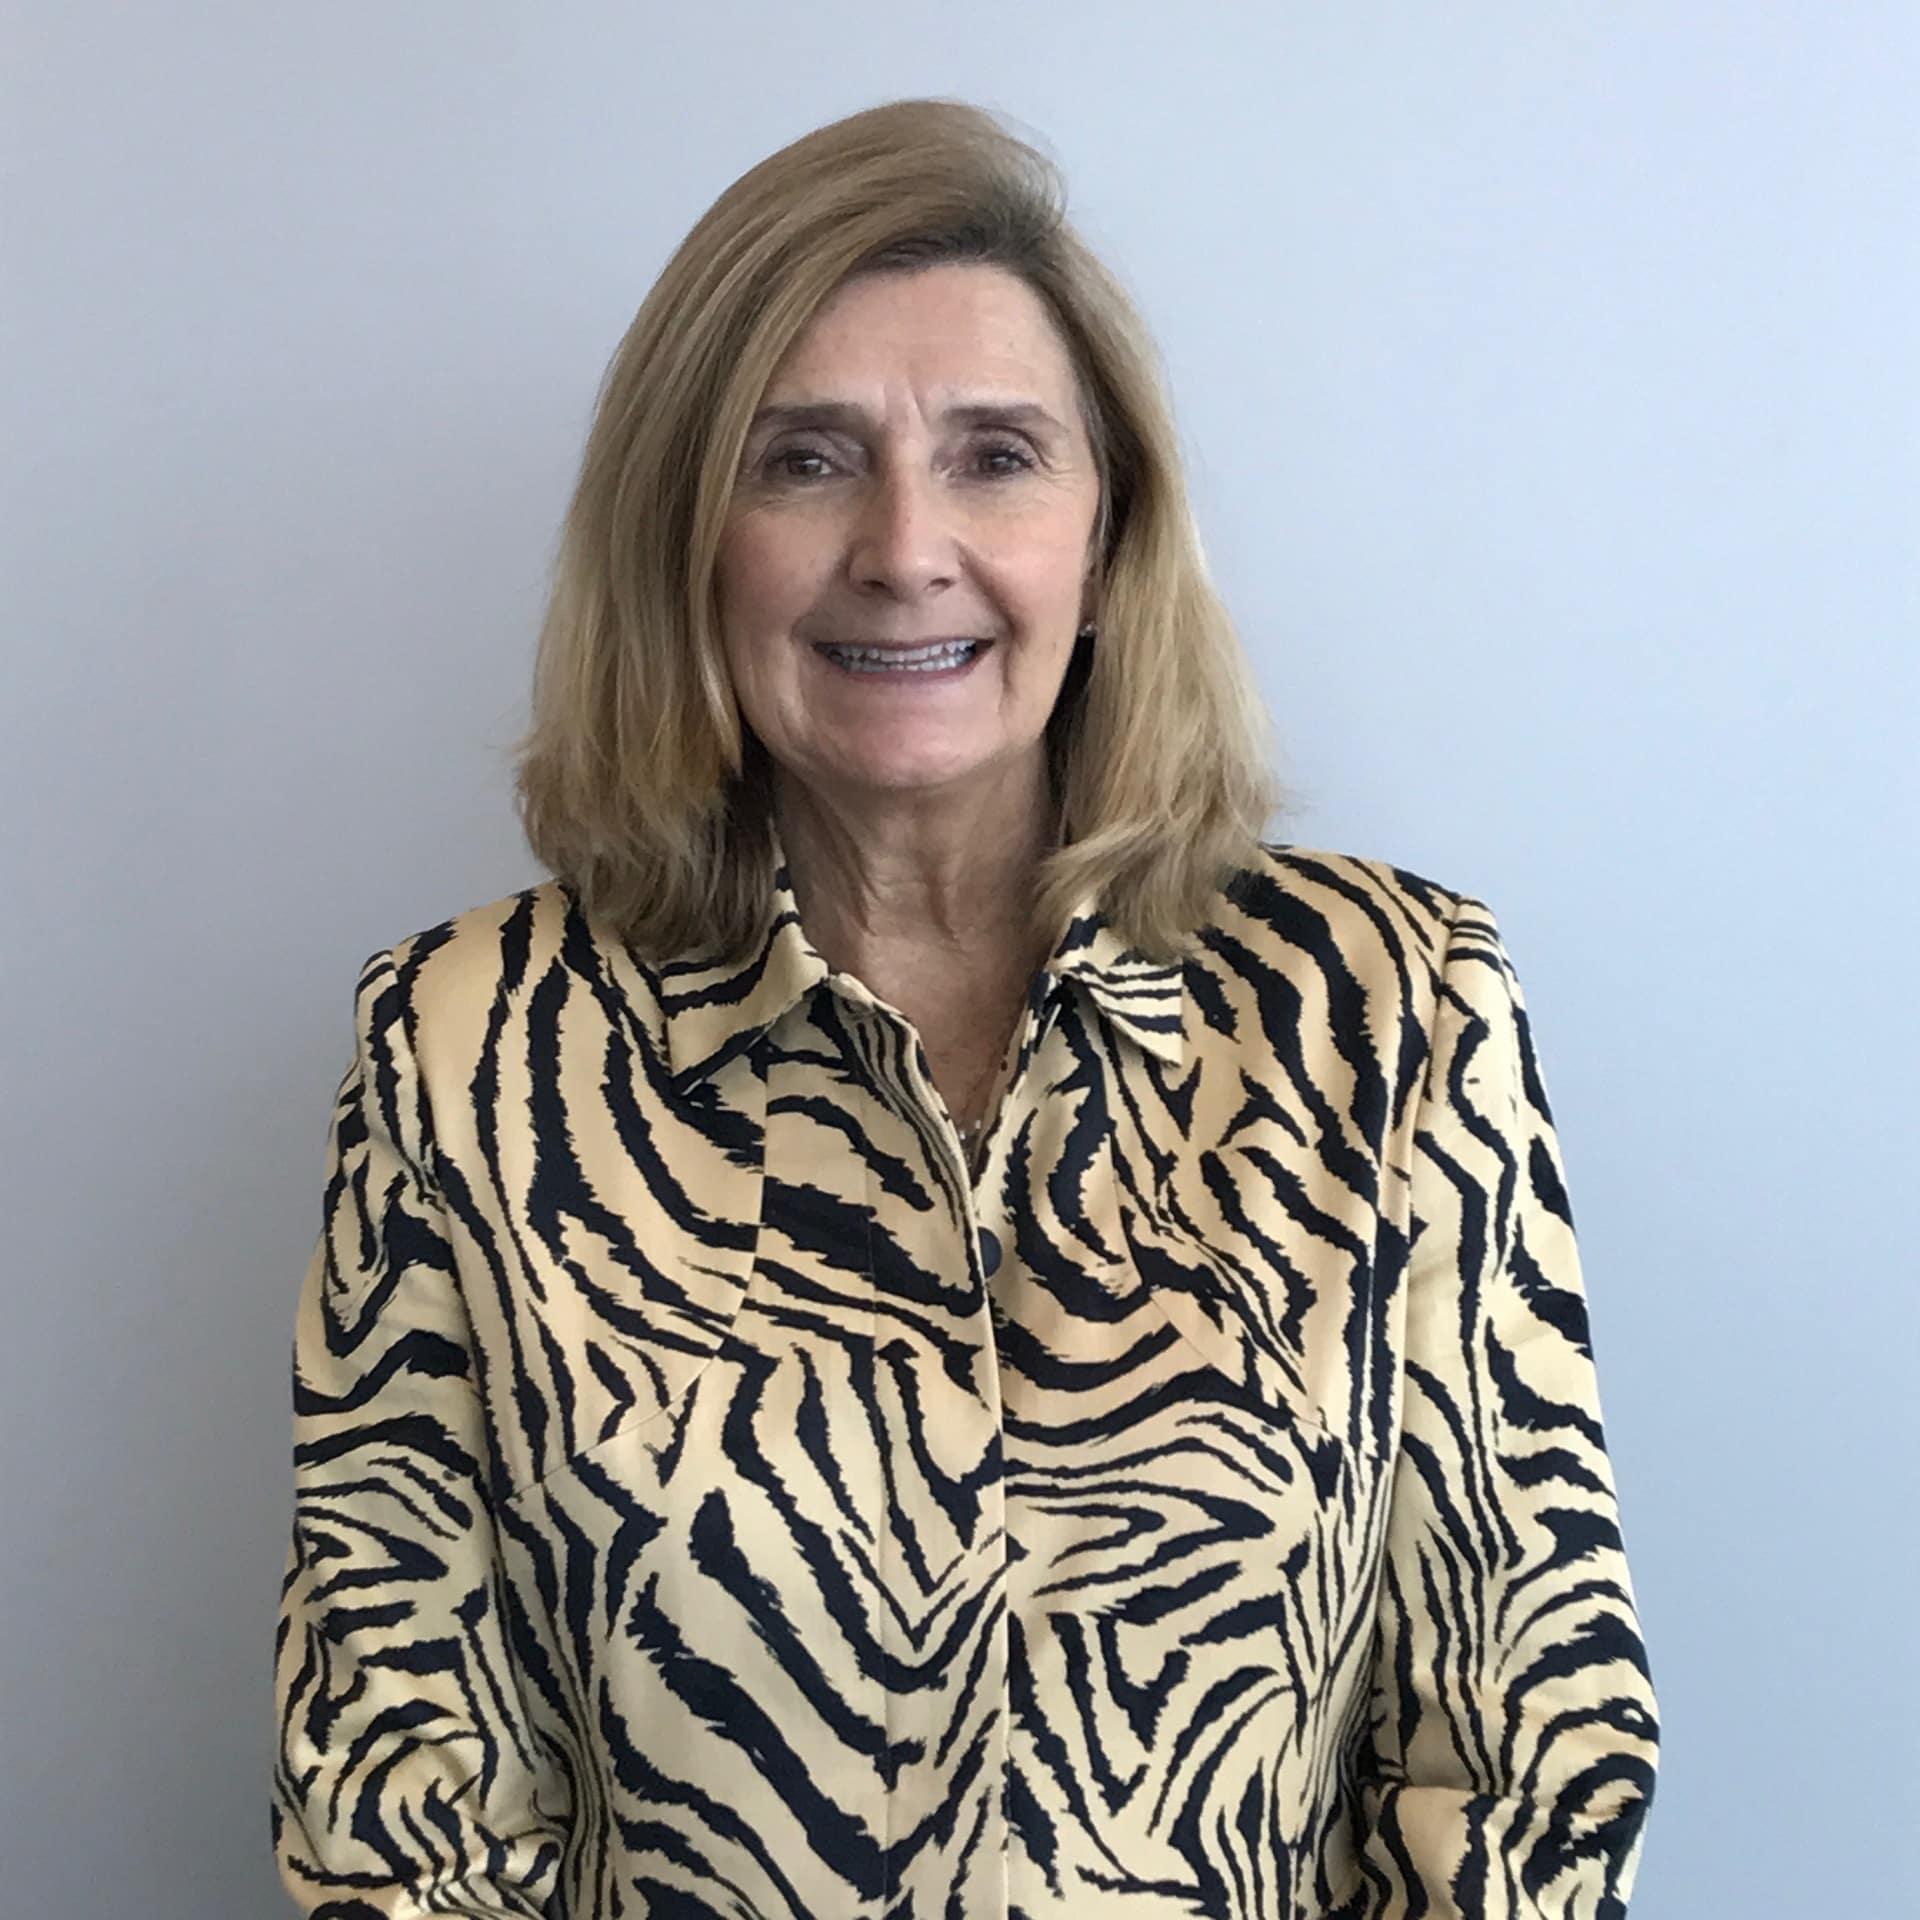 Carolee Papouras